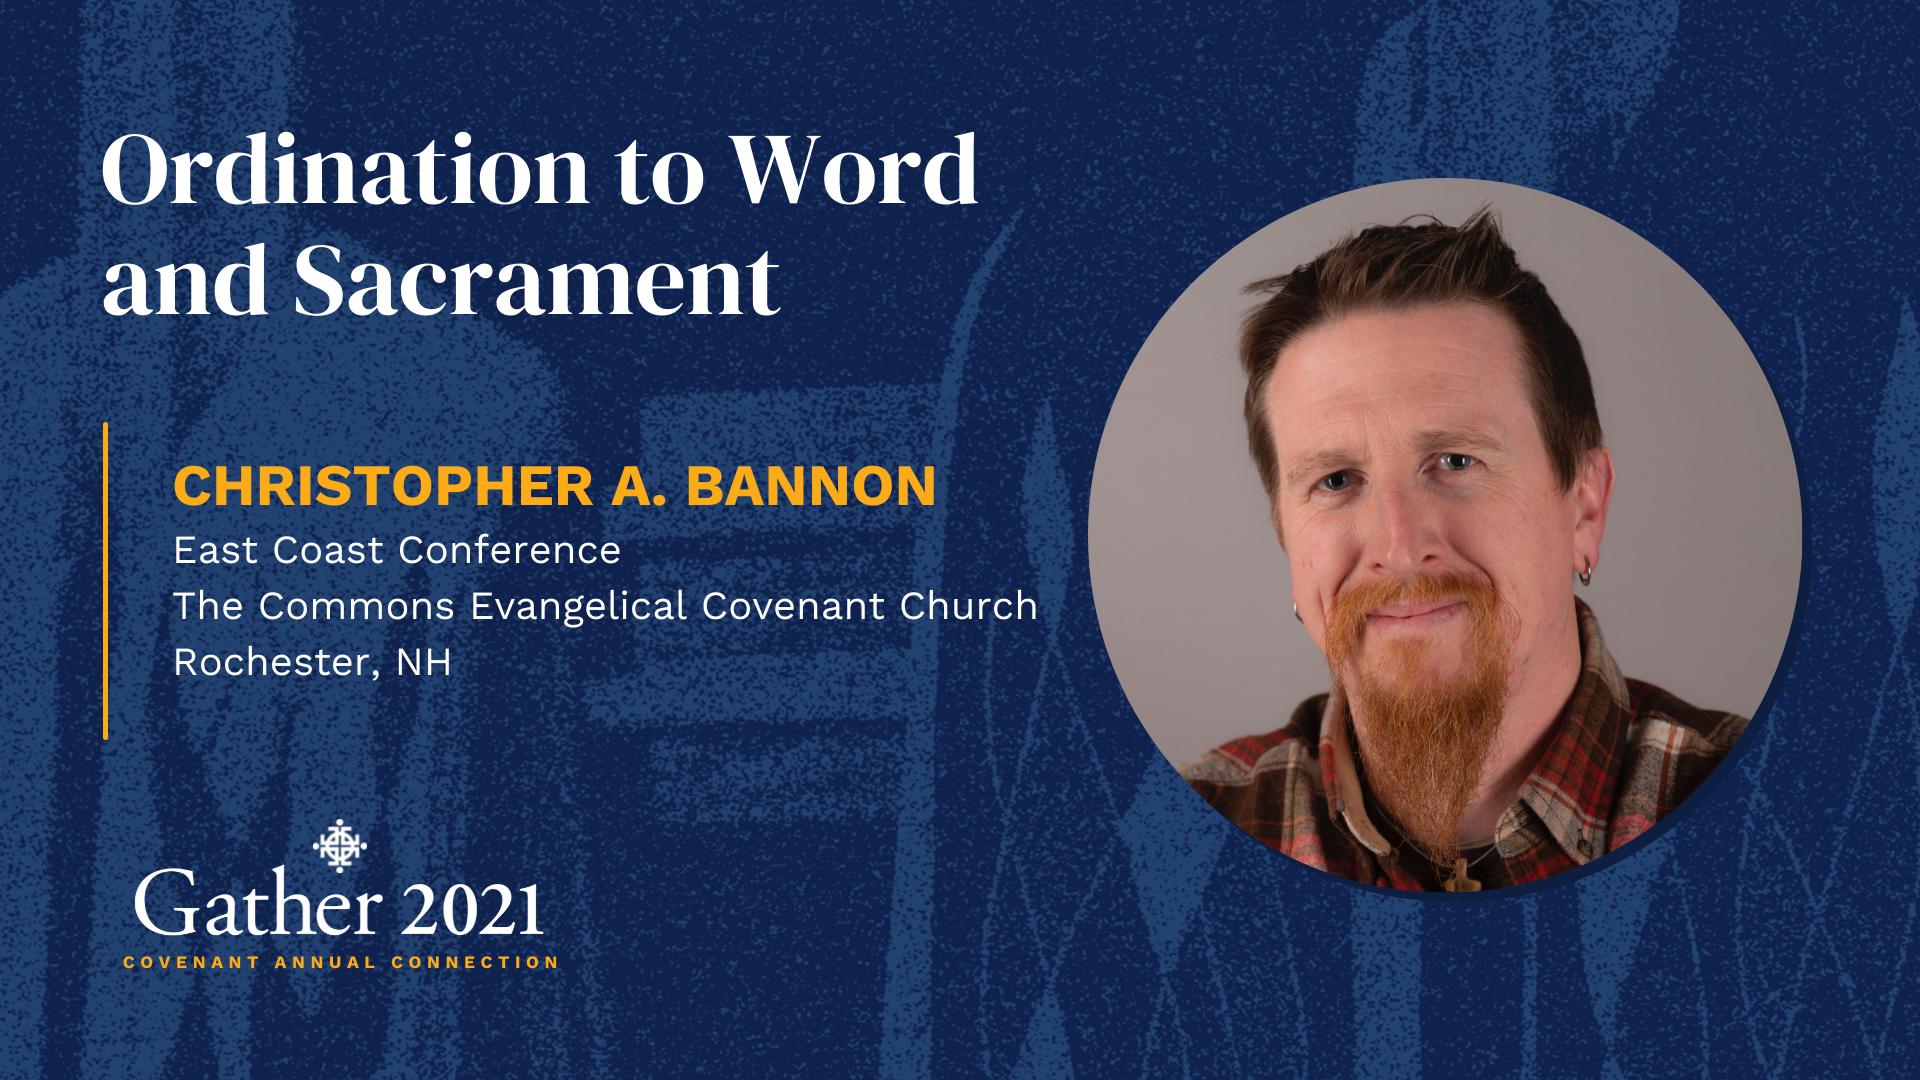 Christopher A. Bannon